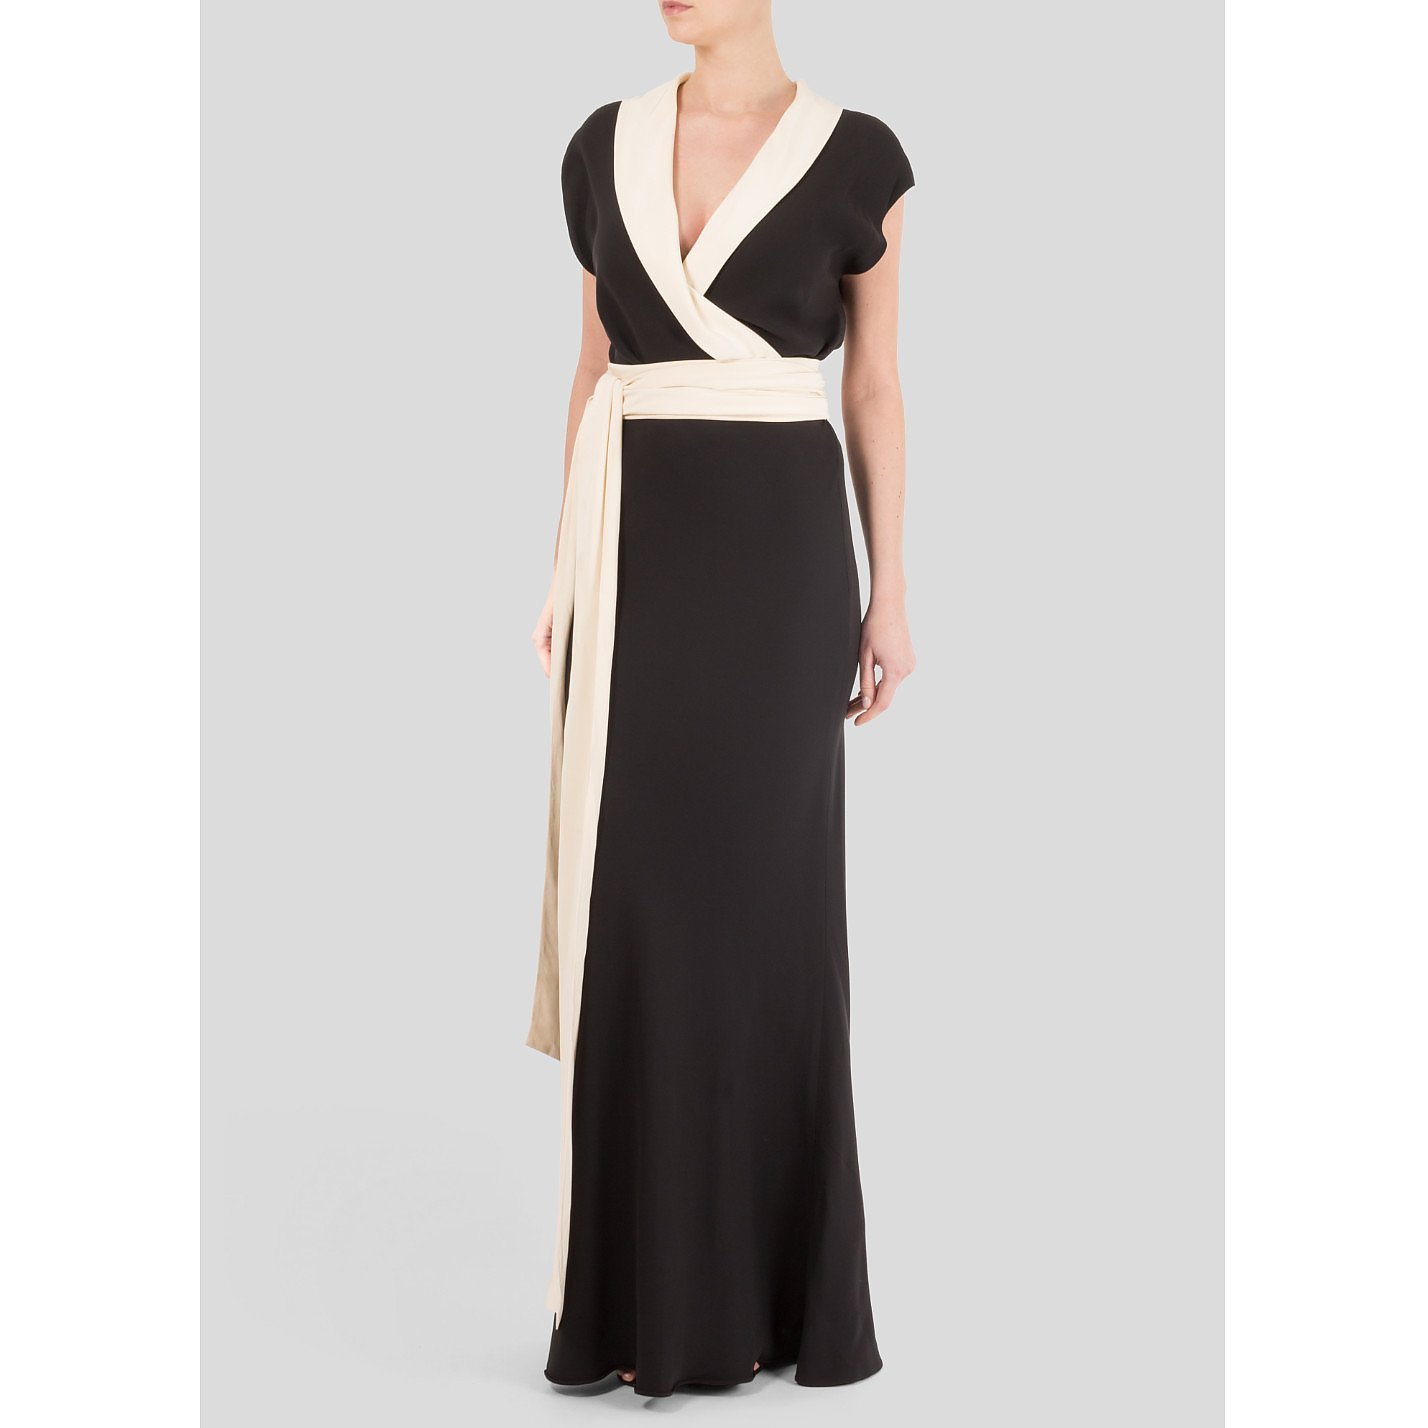 Ralph Lauren Wrap-Effect Monochrome Gown